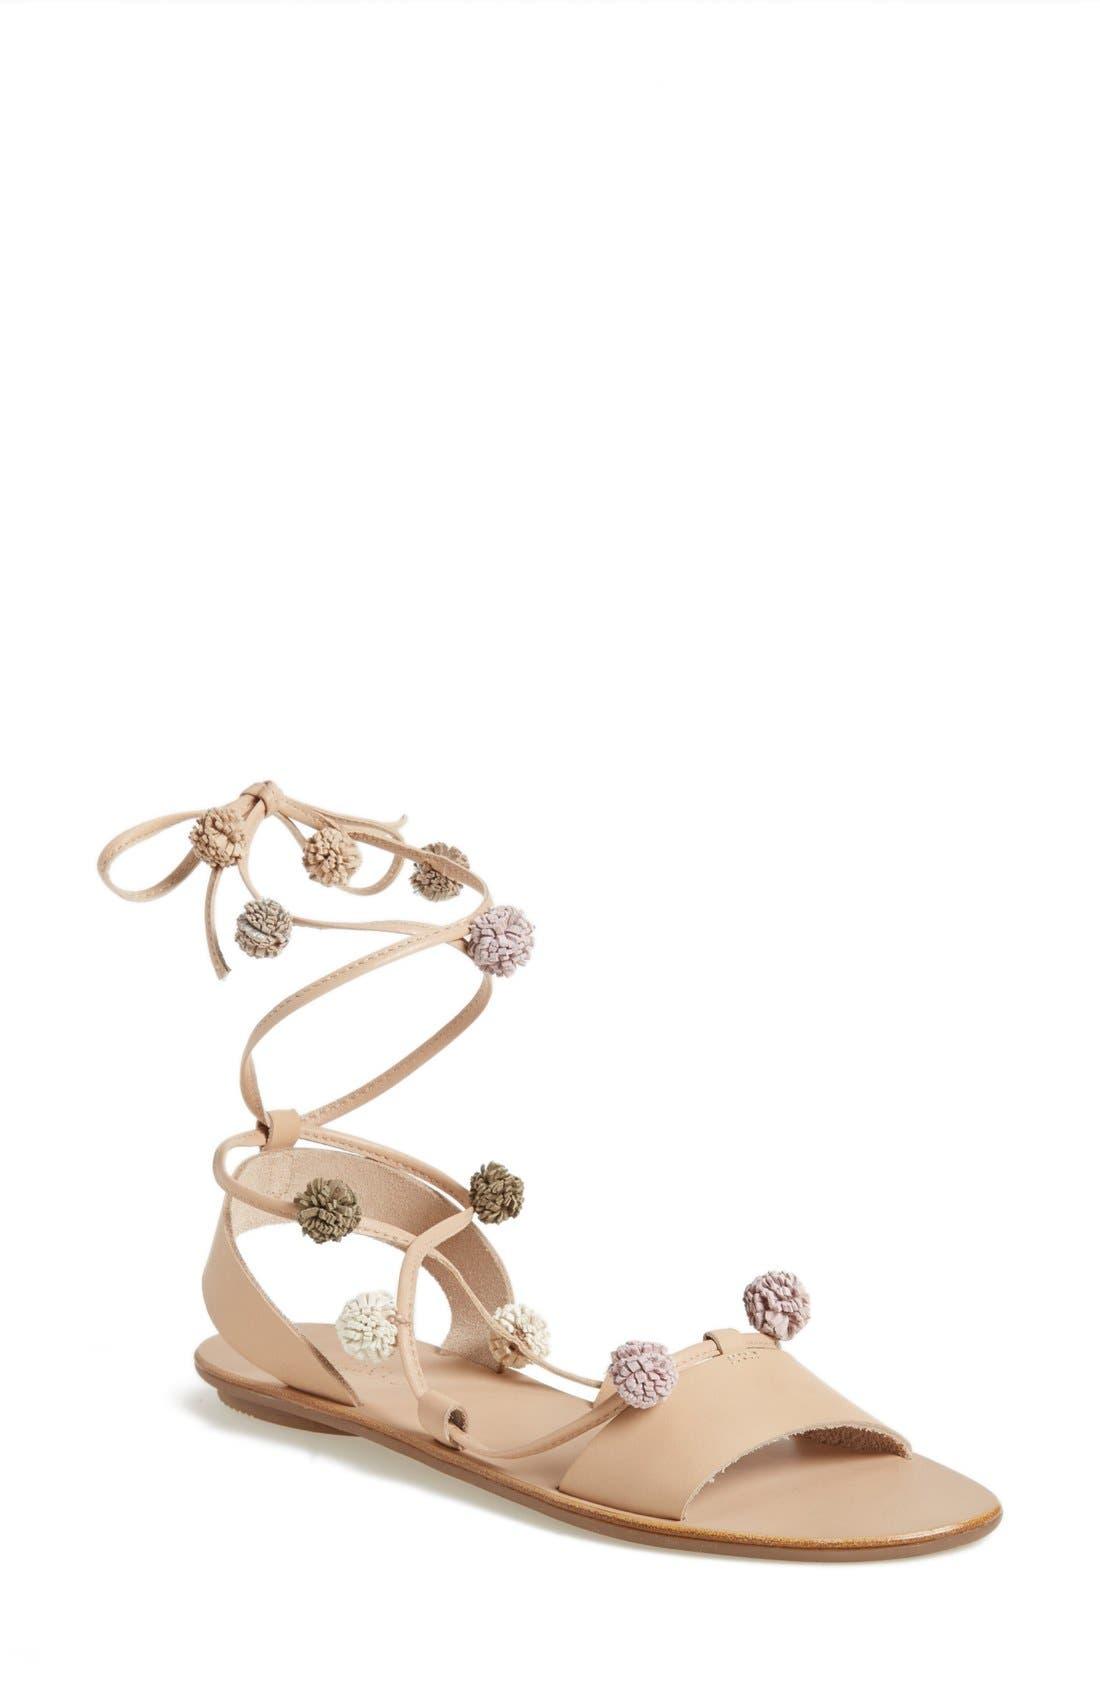 Main Image - Loeffler Randall 'Saskia' Flat Sandal (Women)